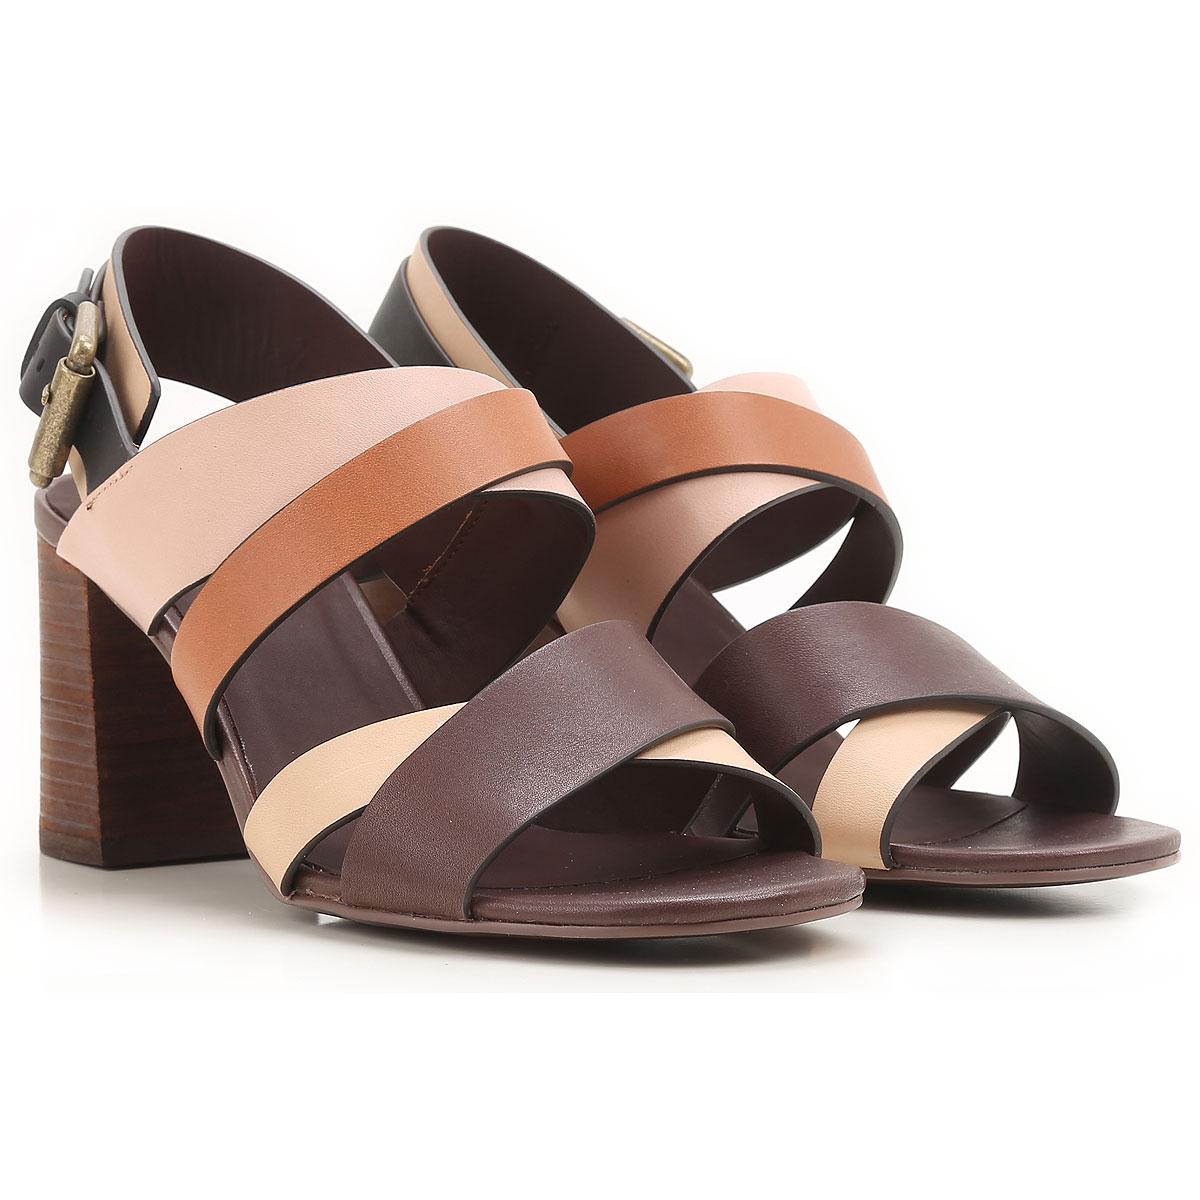 chaussures femme chlo code produit sb28277 05365. Black Bedroom Furniture Sets. Home Design Ideas